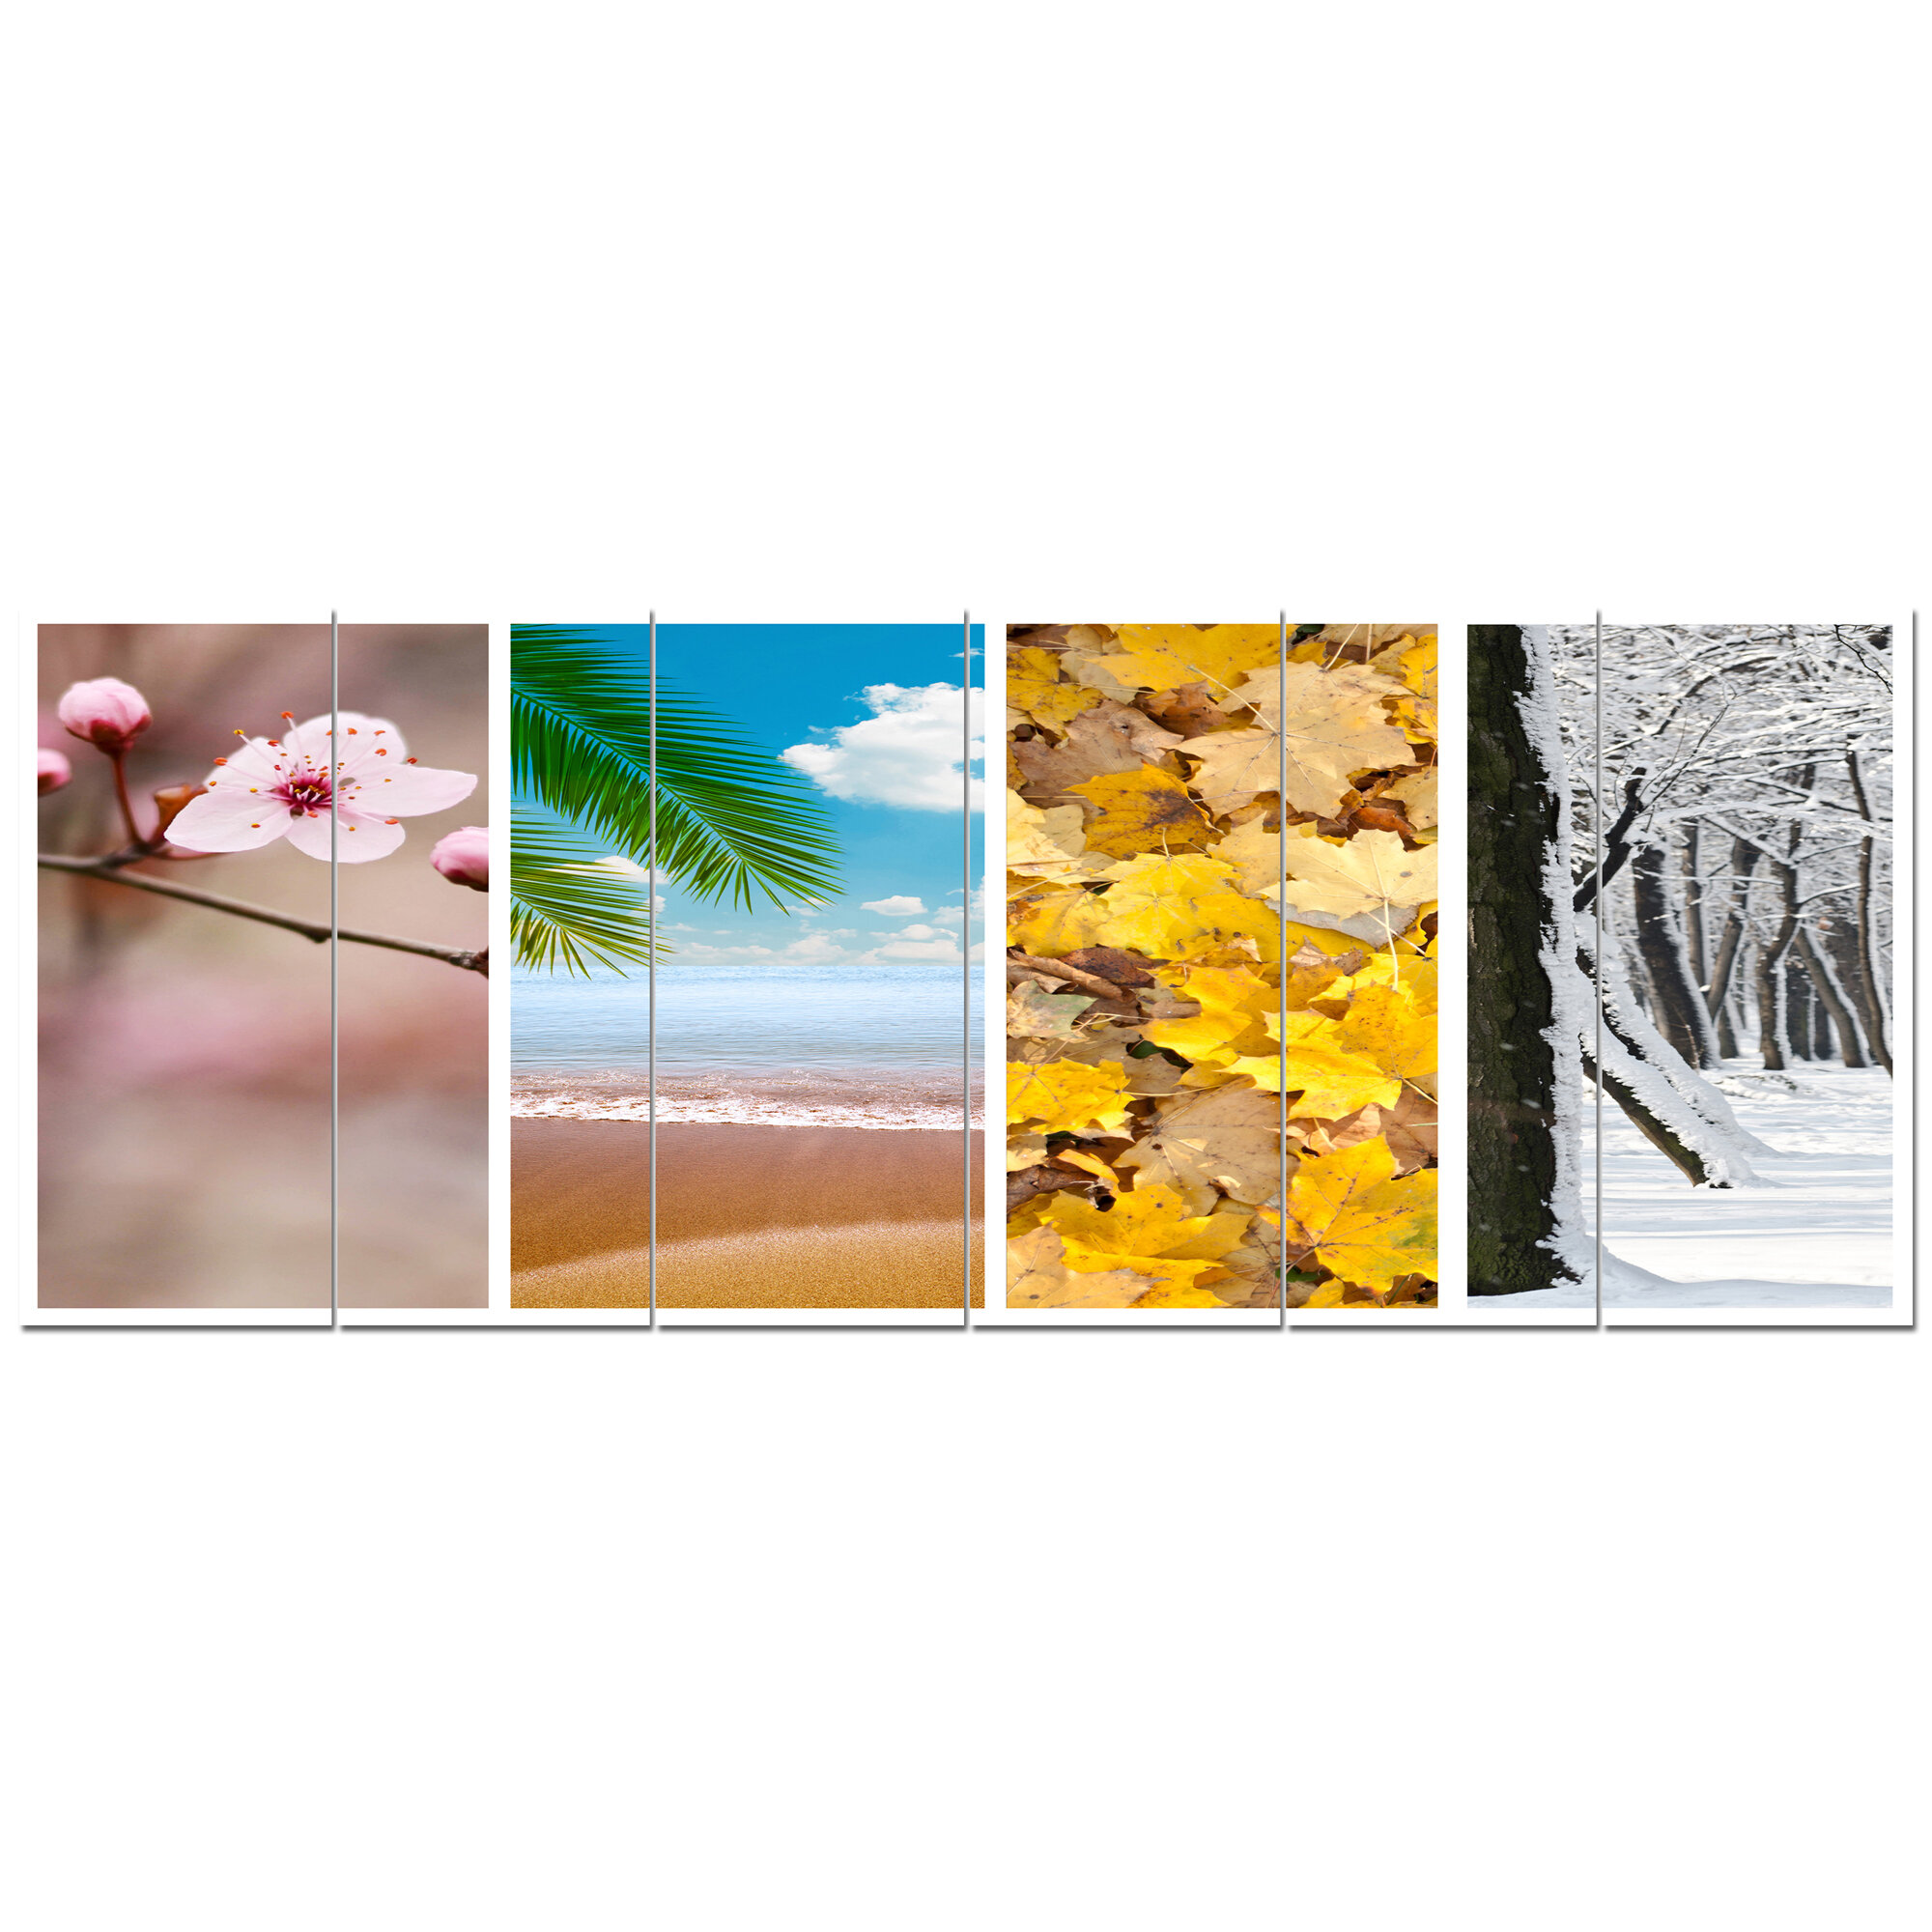 Designart Four Seasons World Collage 6 Piece Photographic Print Set On Canvas Wayfair